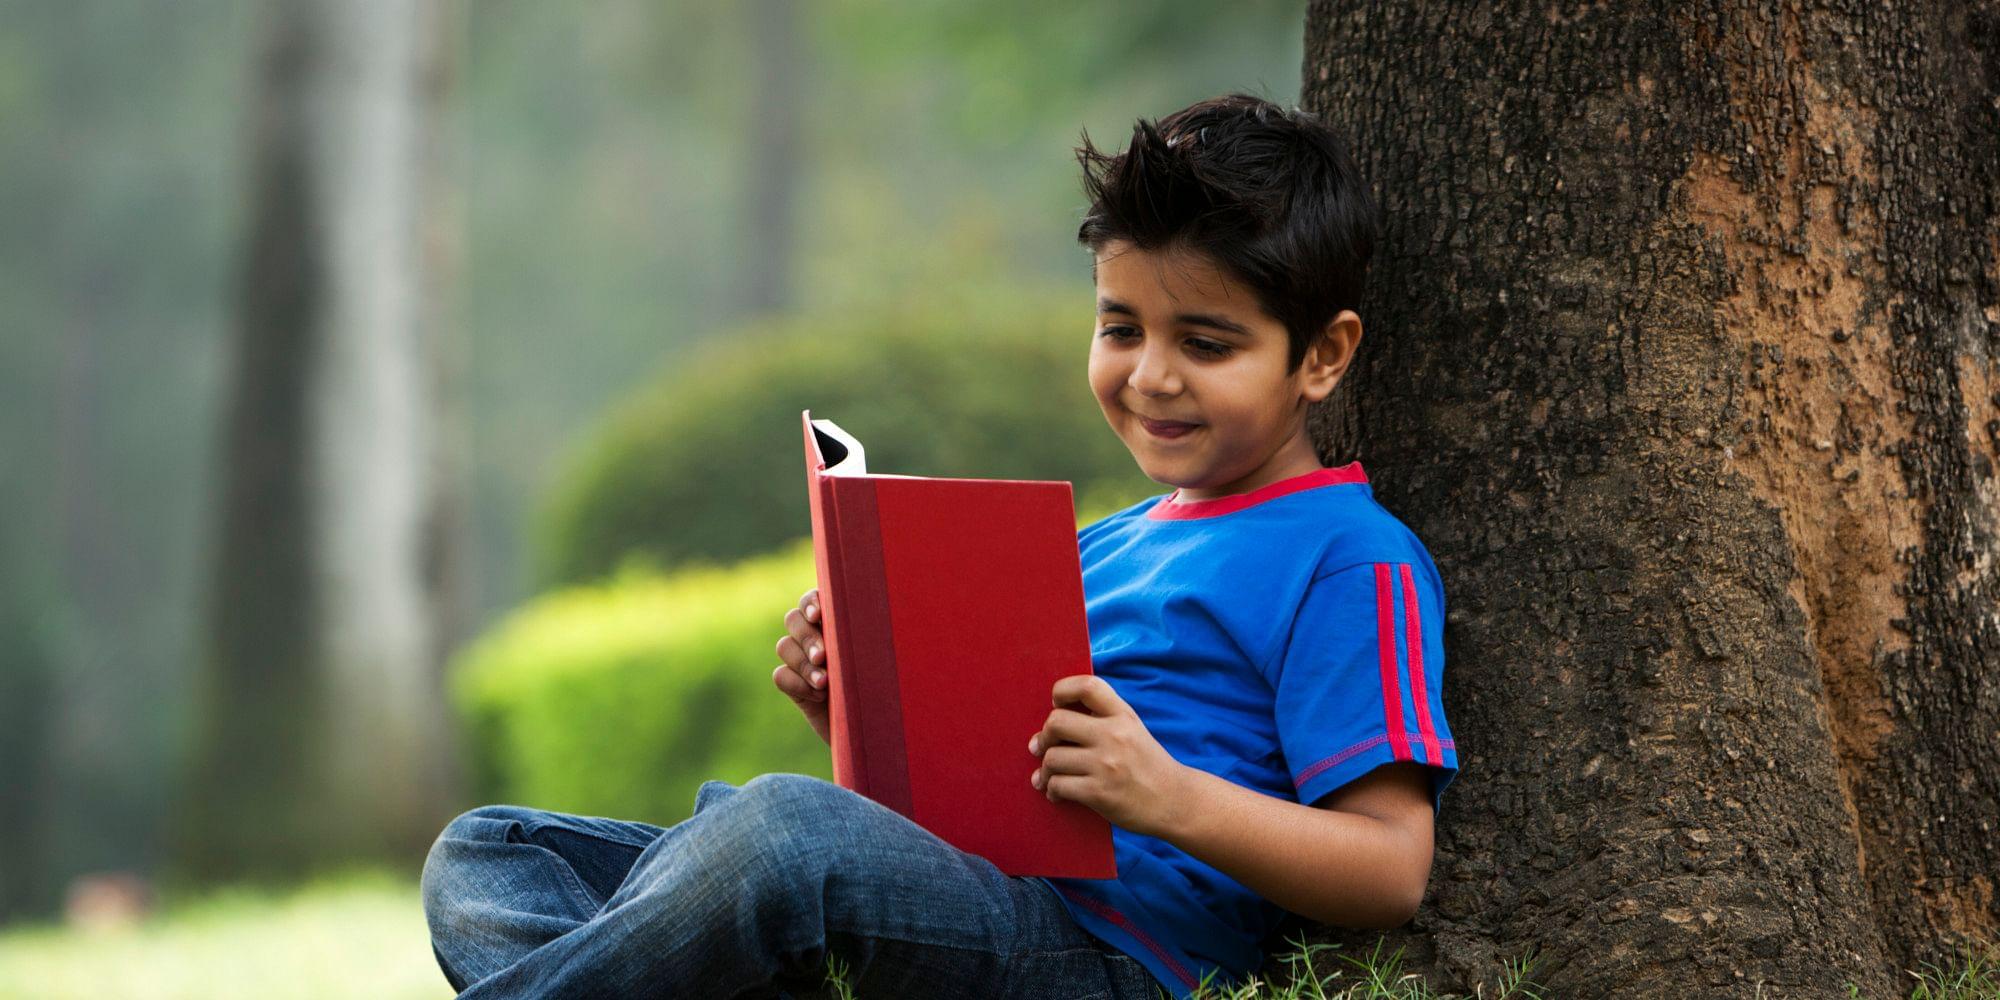 Boy (6-7) reading book under tree